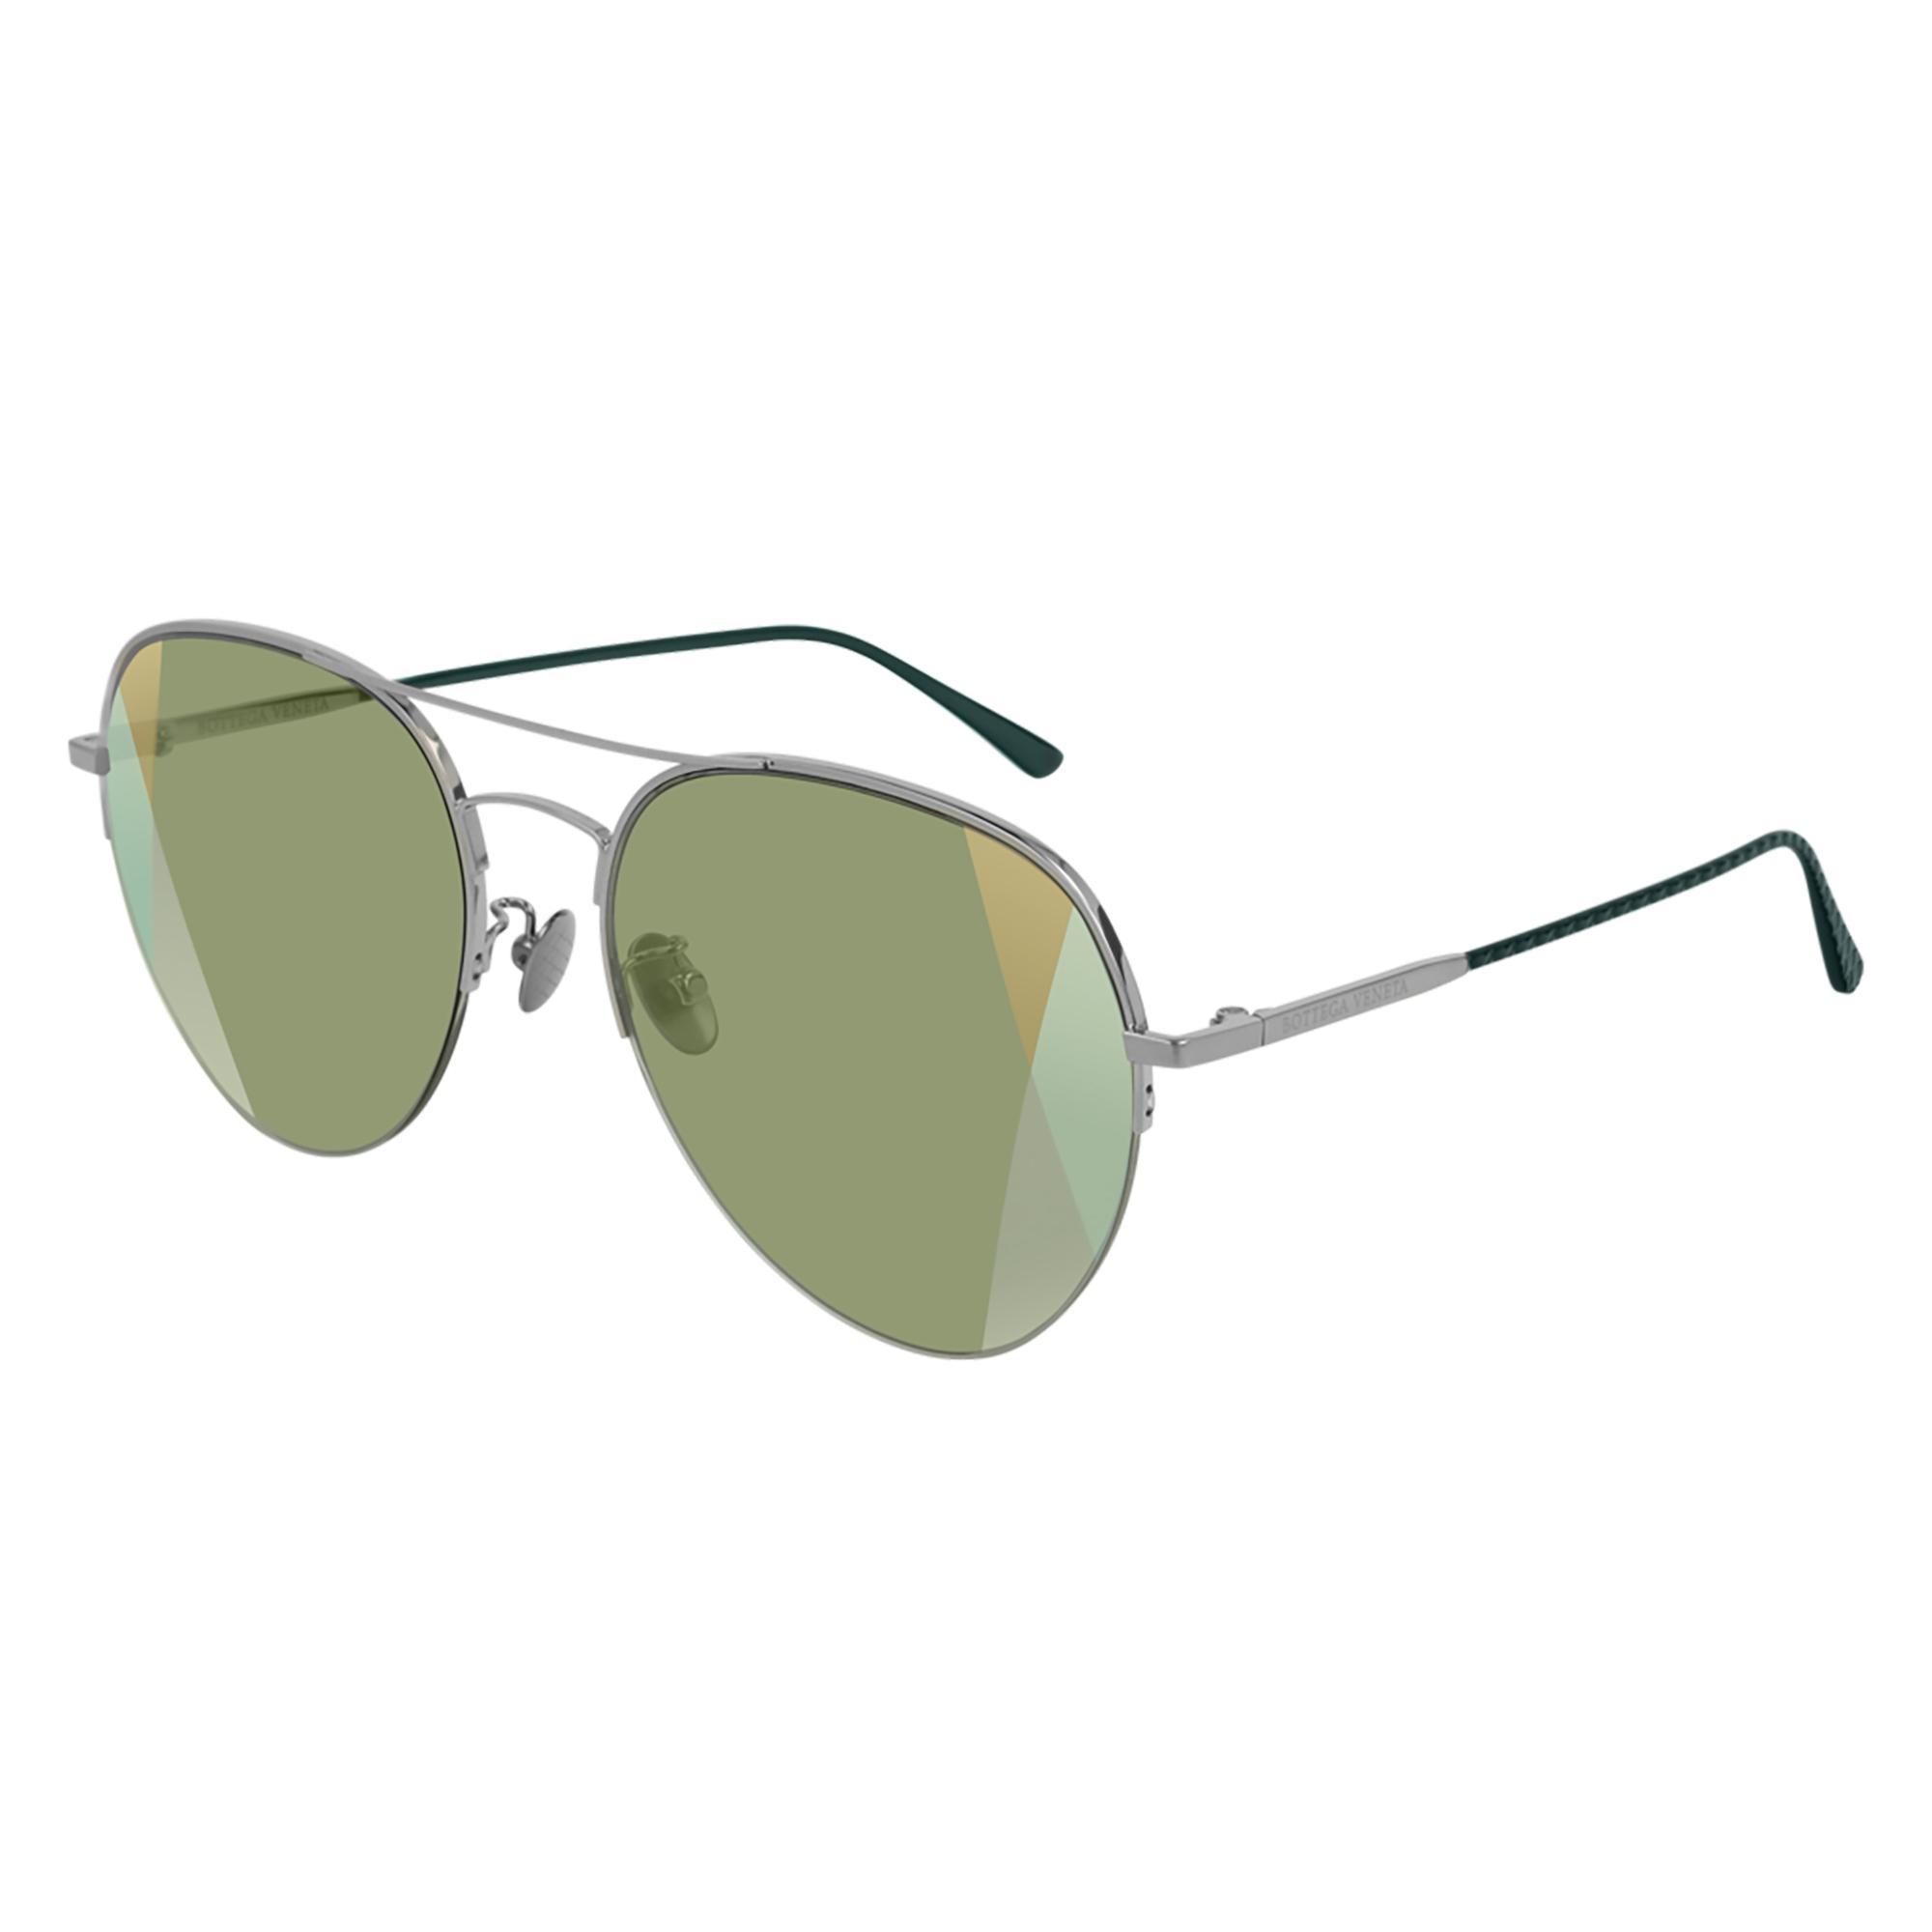 008 silver green green